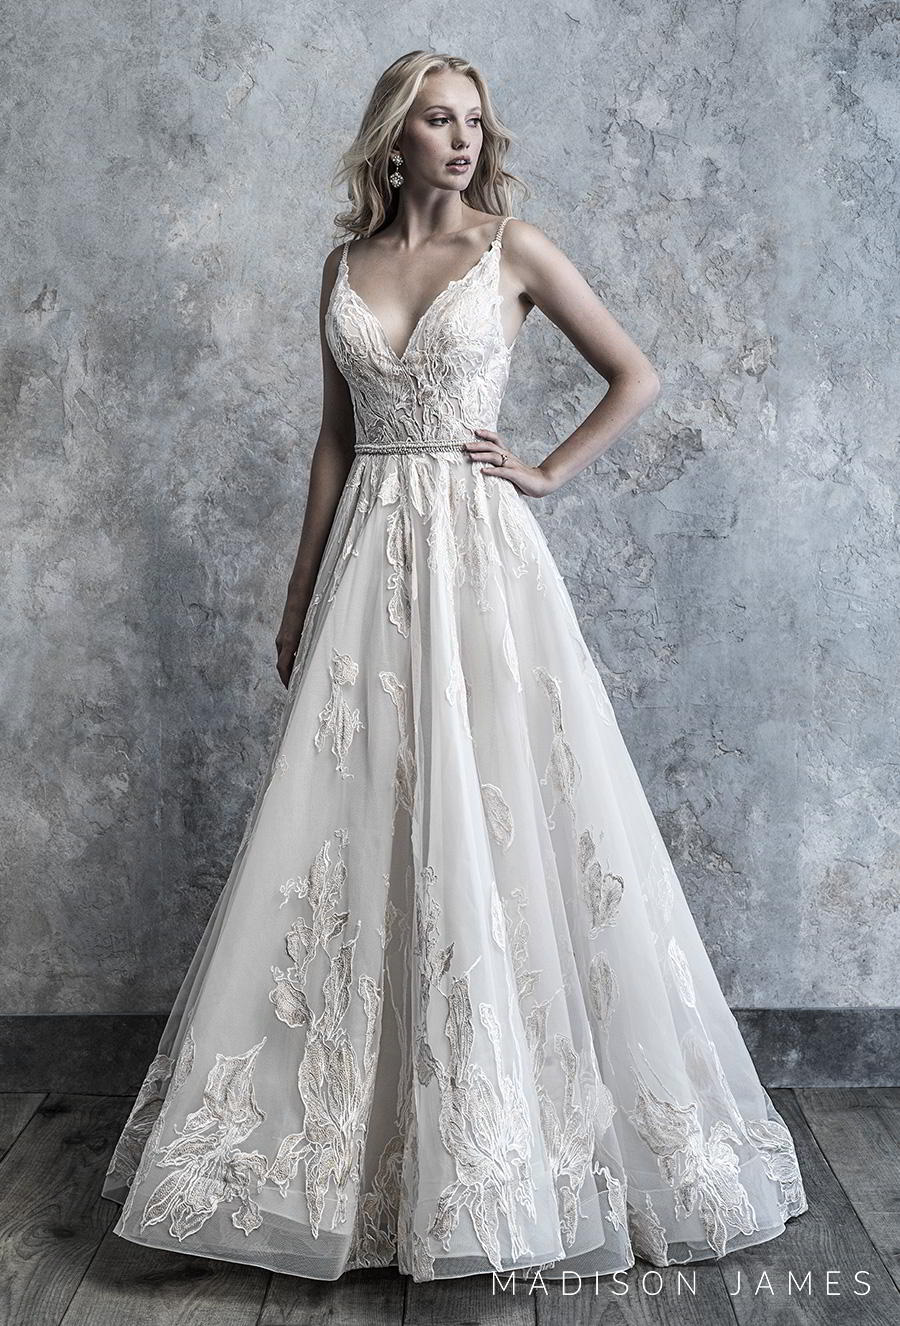 madison james 2019 bridal sleeveless spaghetti strap v neck full embellishment romantic a line wedding dress backless chapel train (503) mv